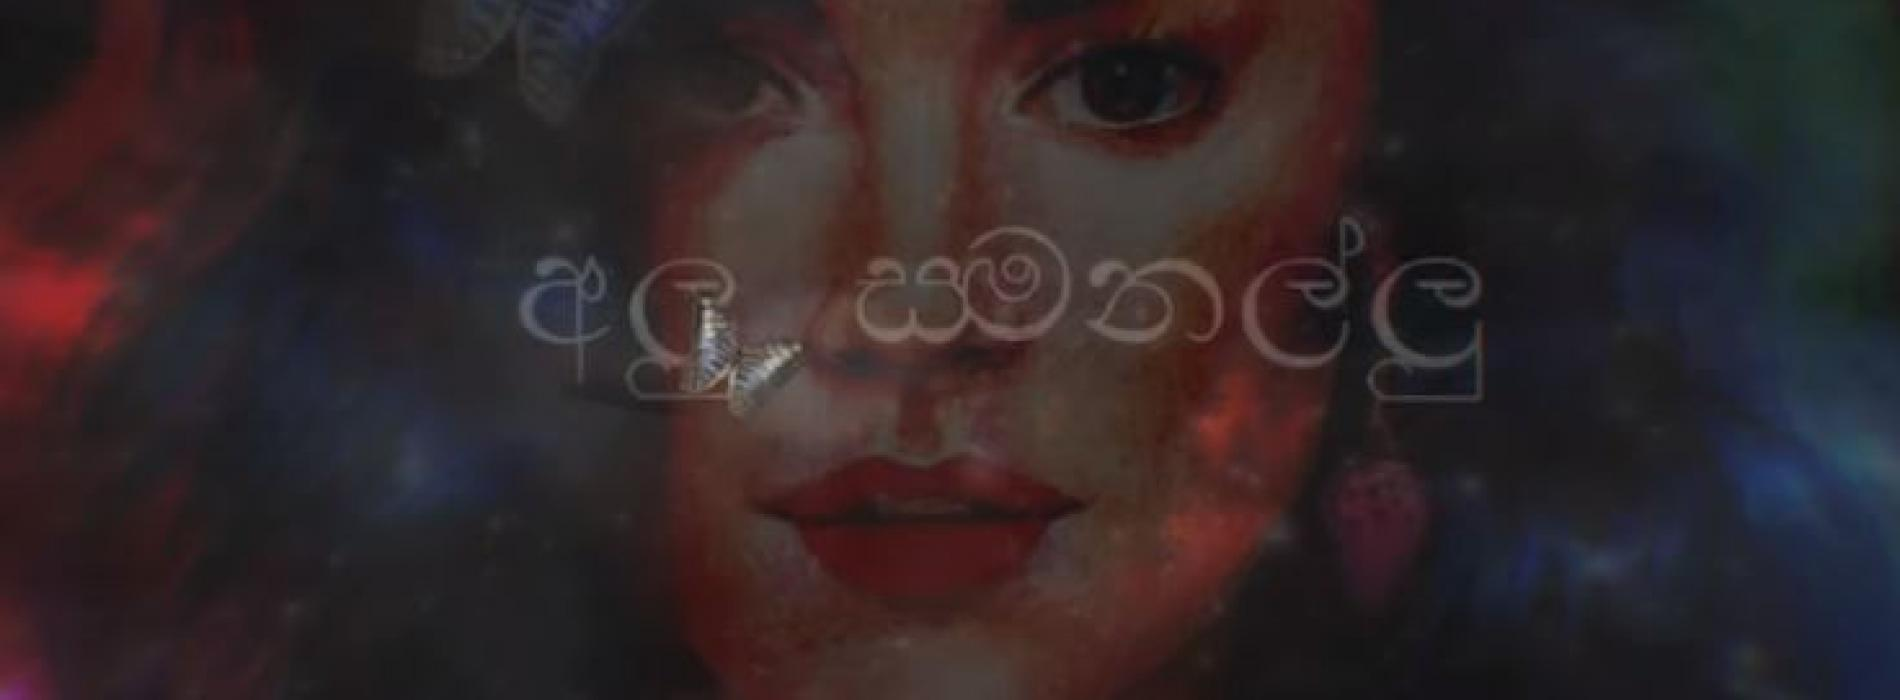 New Music : Dr BSKing – Alu Samanallu (අලු සමනල්ලු) ft Dhyan Hewage & Mister D (Lyric Video)